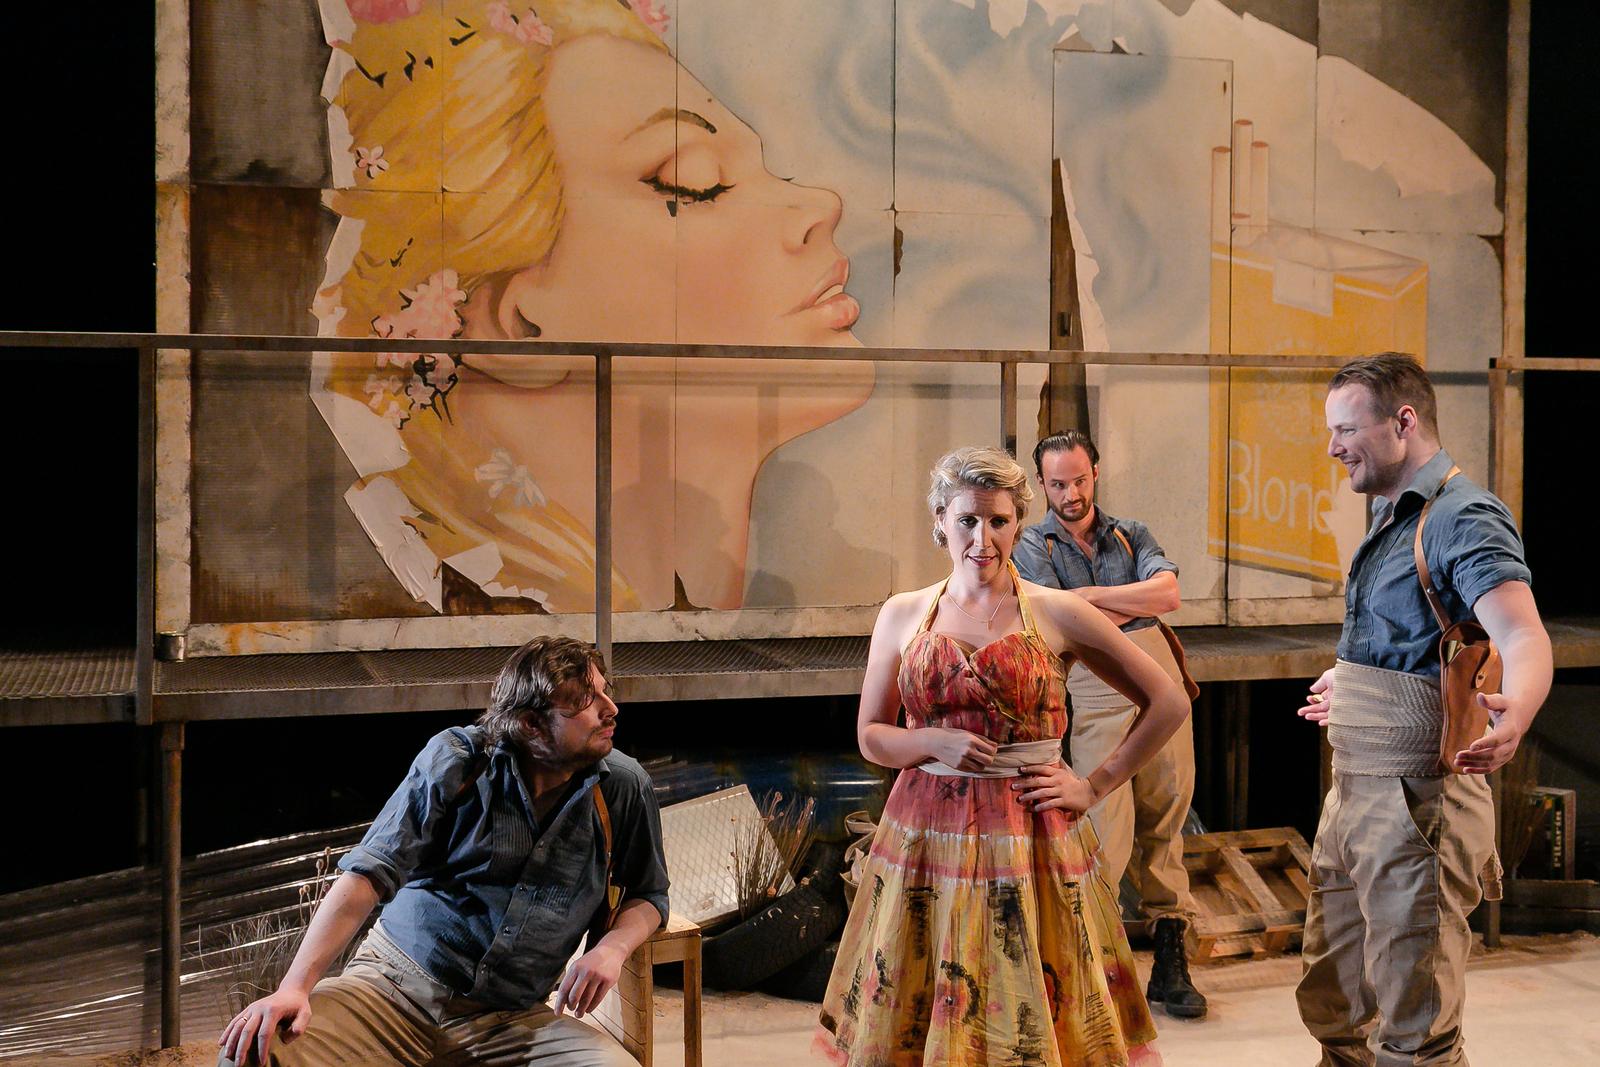 Carmen (OperaUpClose). Marcin Gesla (Zuniga), Louisa Tee (Micaëla), Lawrence Olsworth-Peter (Remendado), Tom Stoddart (Dancairo). Photo Andreas Greiger.